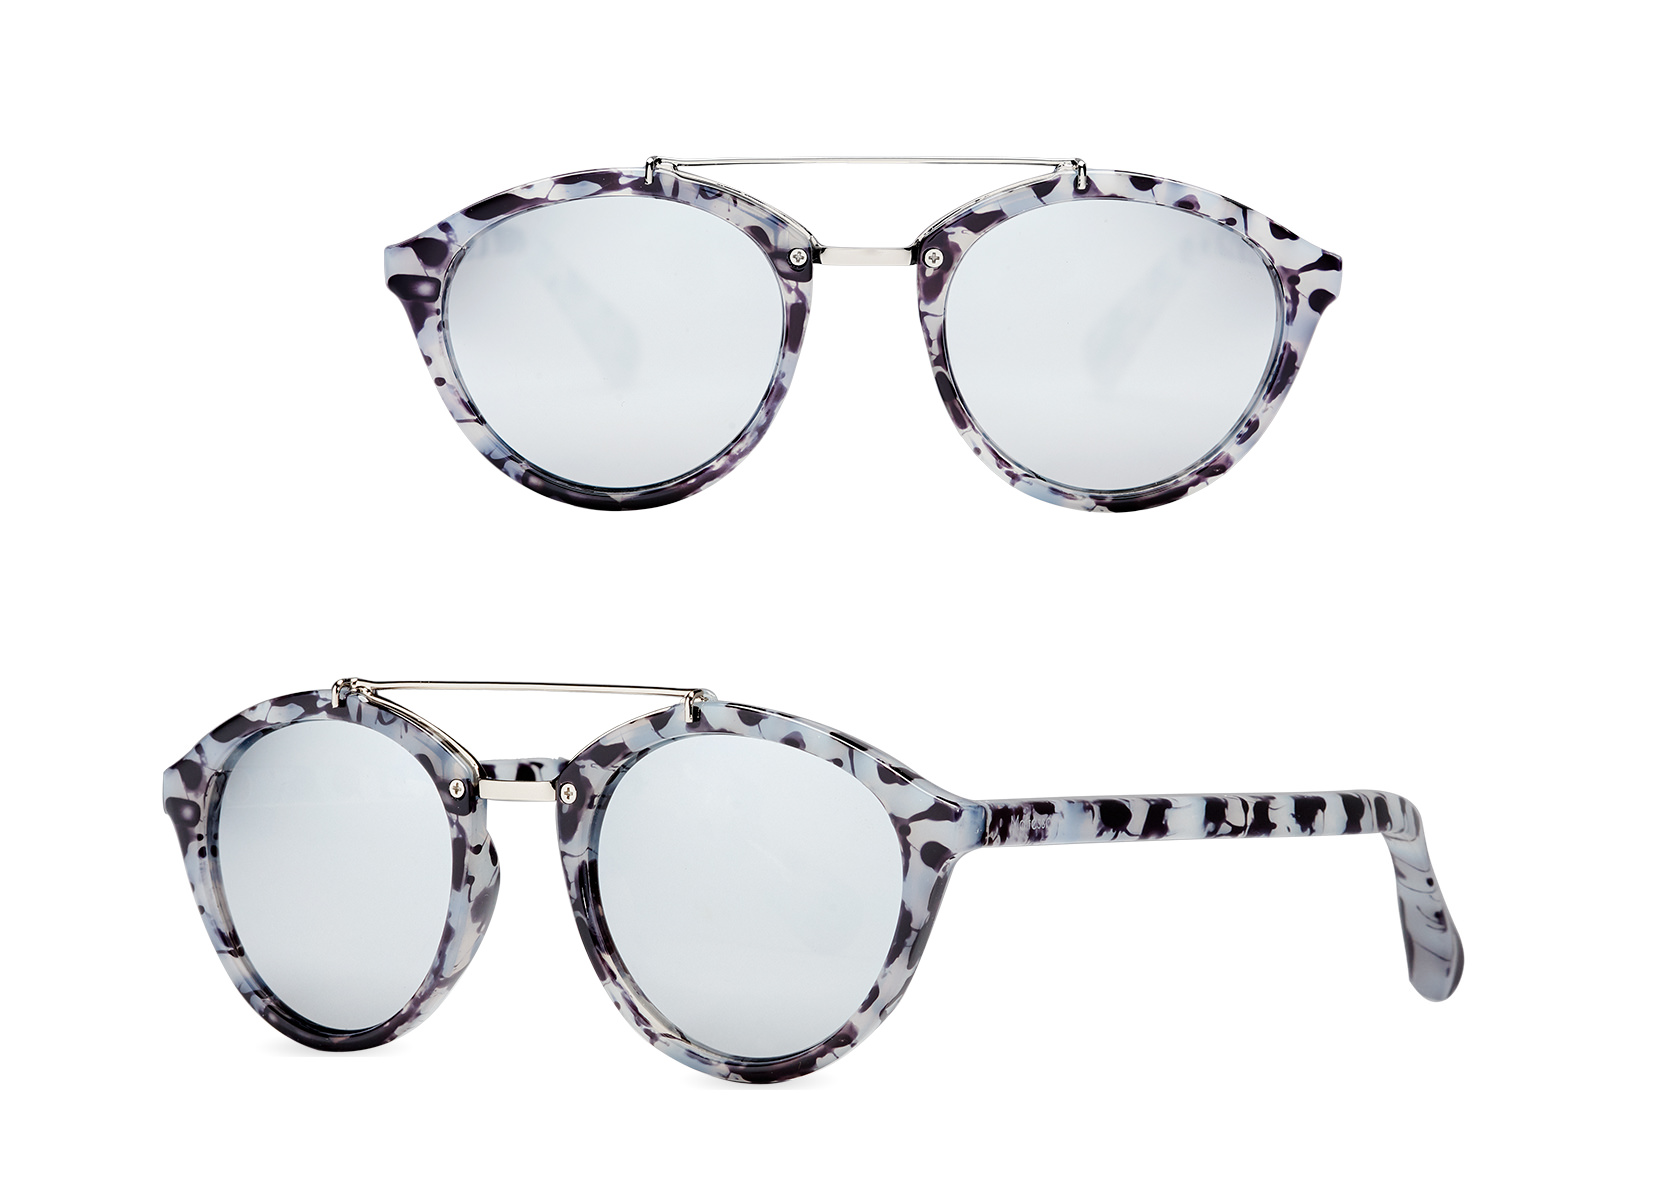 Fotografo profesional experto en ecommerce de gafas en Málaga